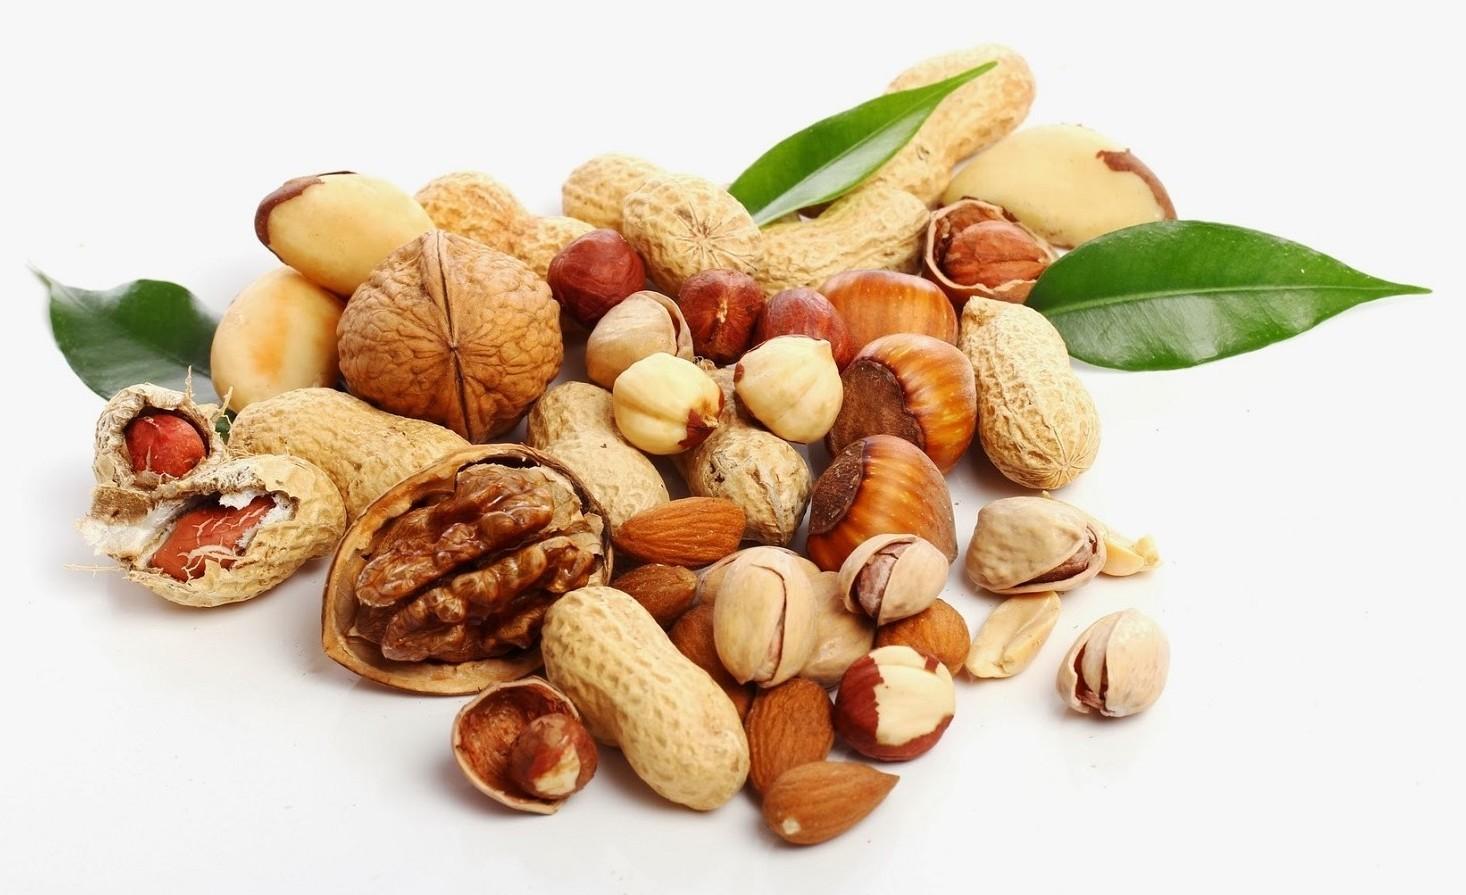 Frutta secca: molteplici benefici di una